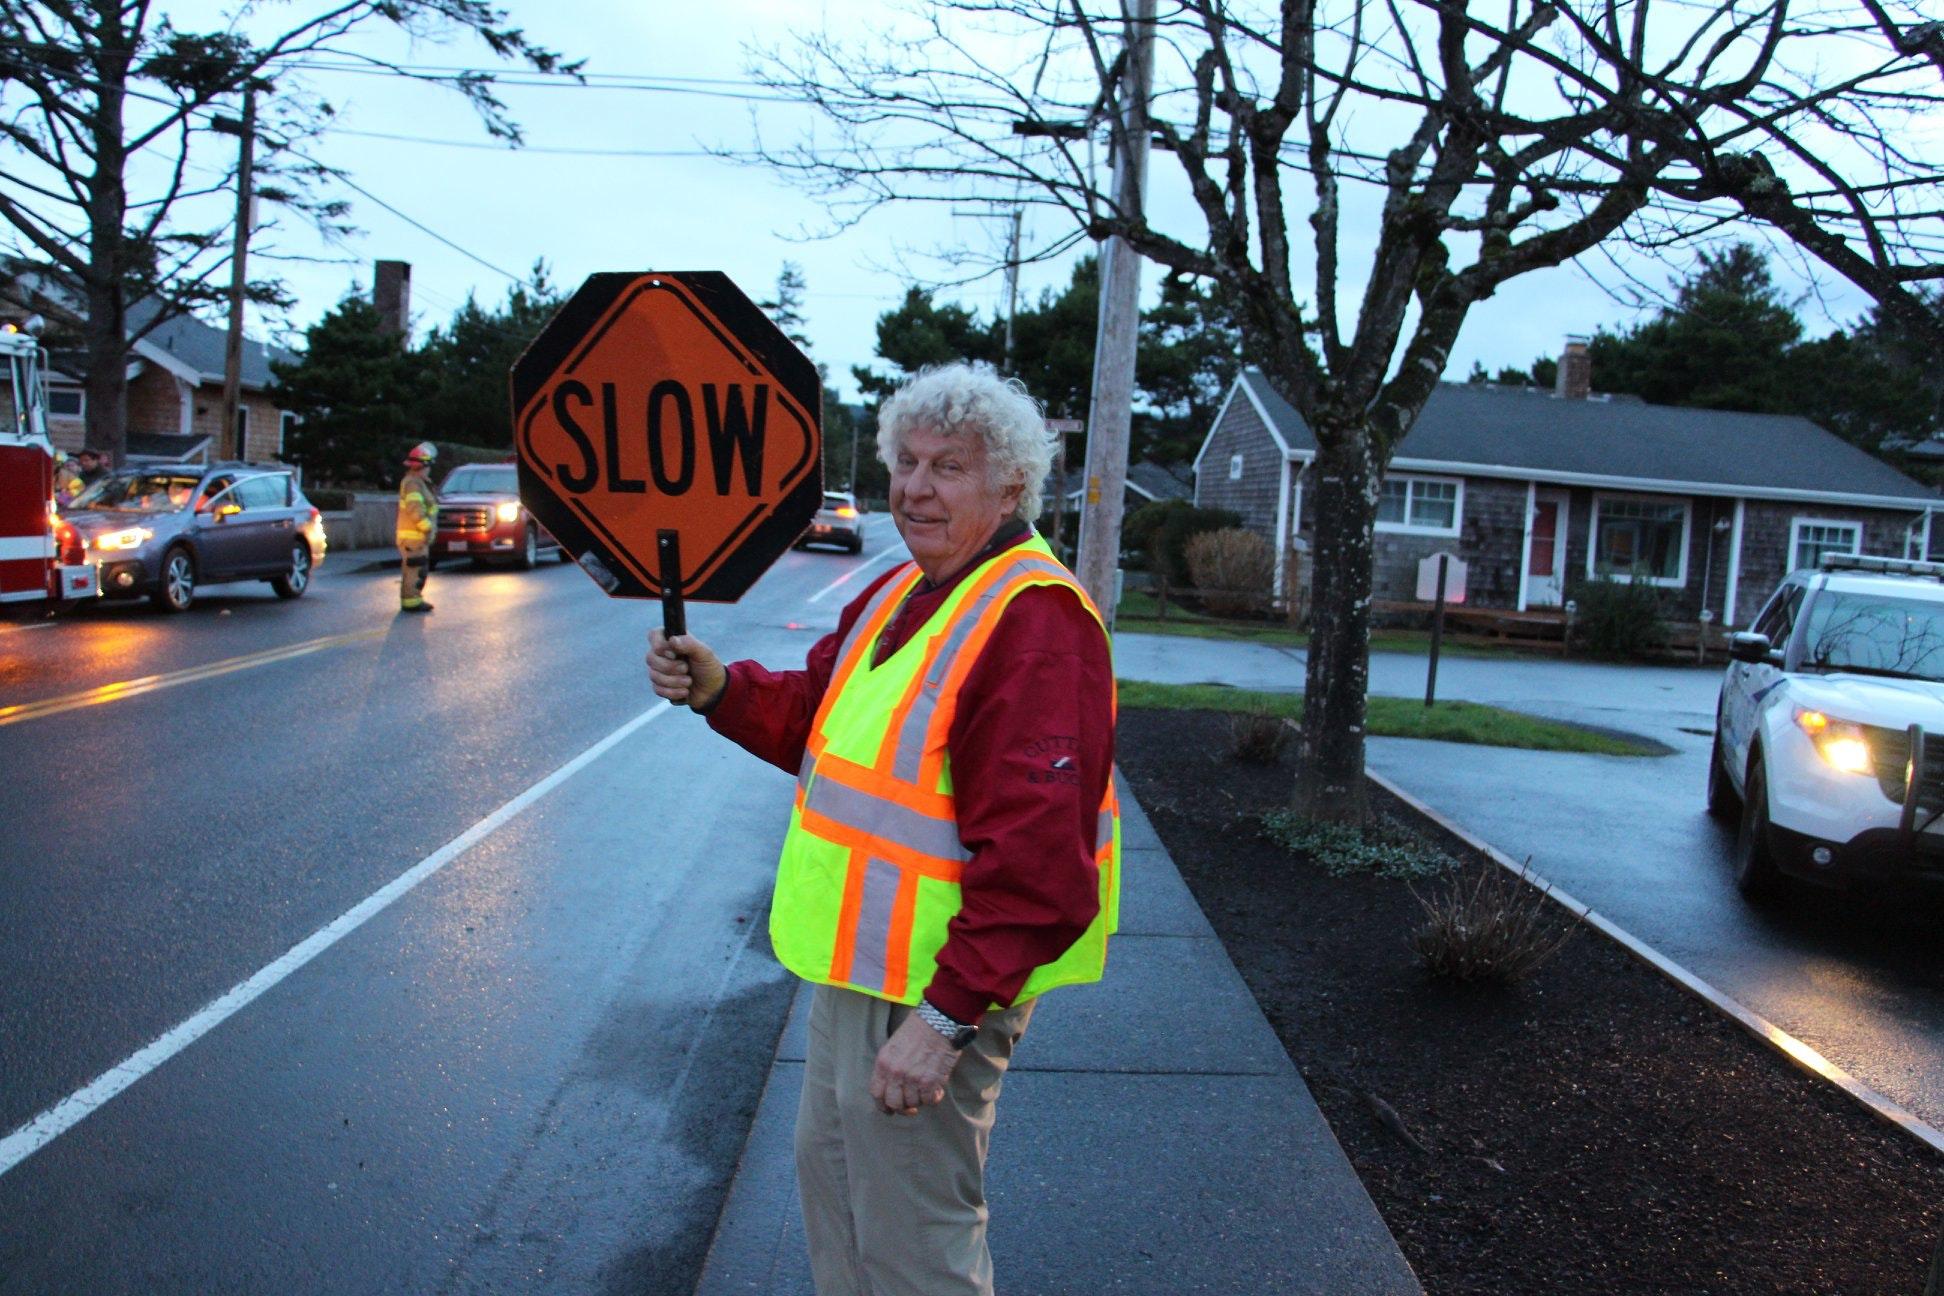 May contain: car, vehicle, transportation, automobile, human, person, asphalt, and tarmac